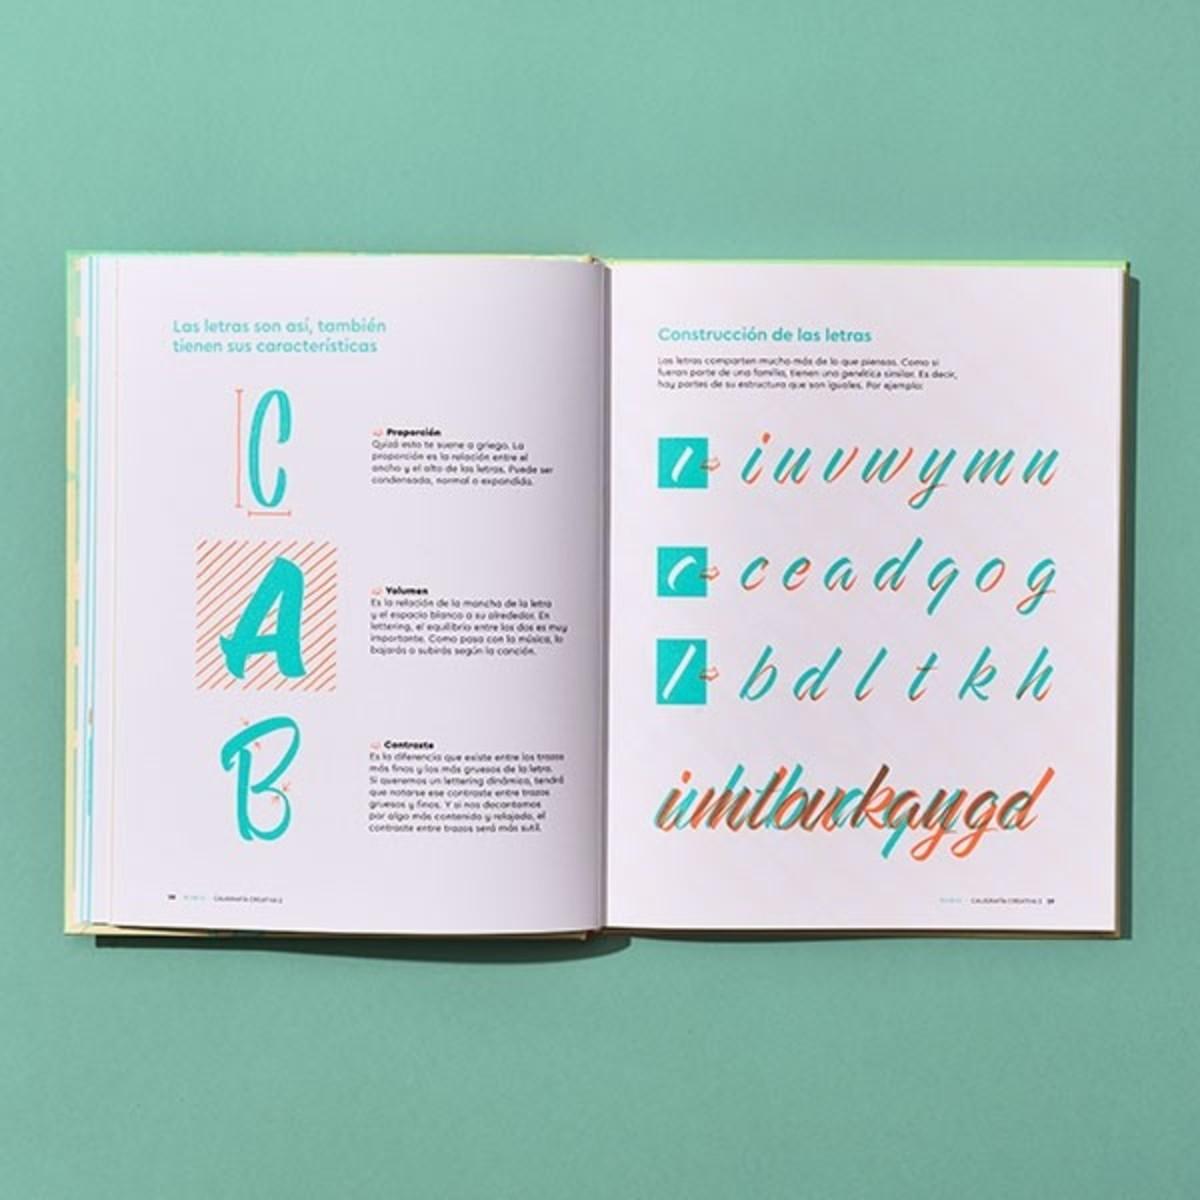 Caligrafía Creativa 3 - Cursiva inglesa